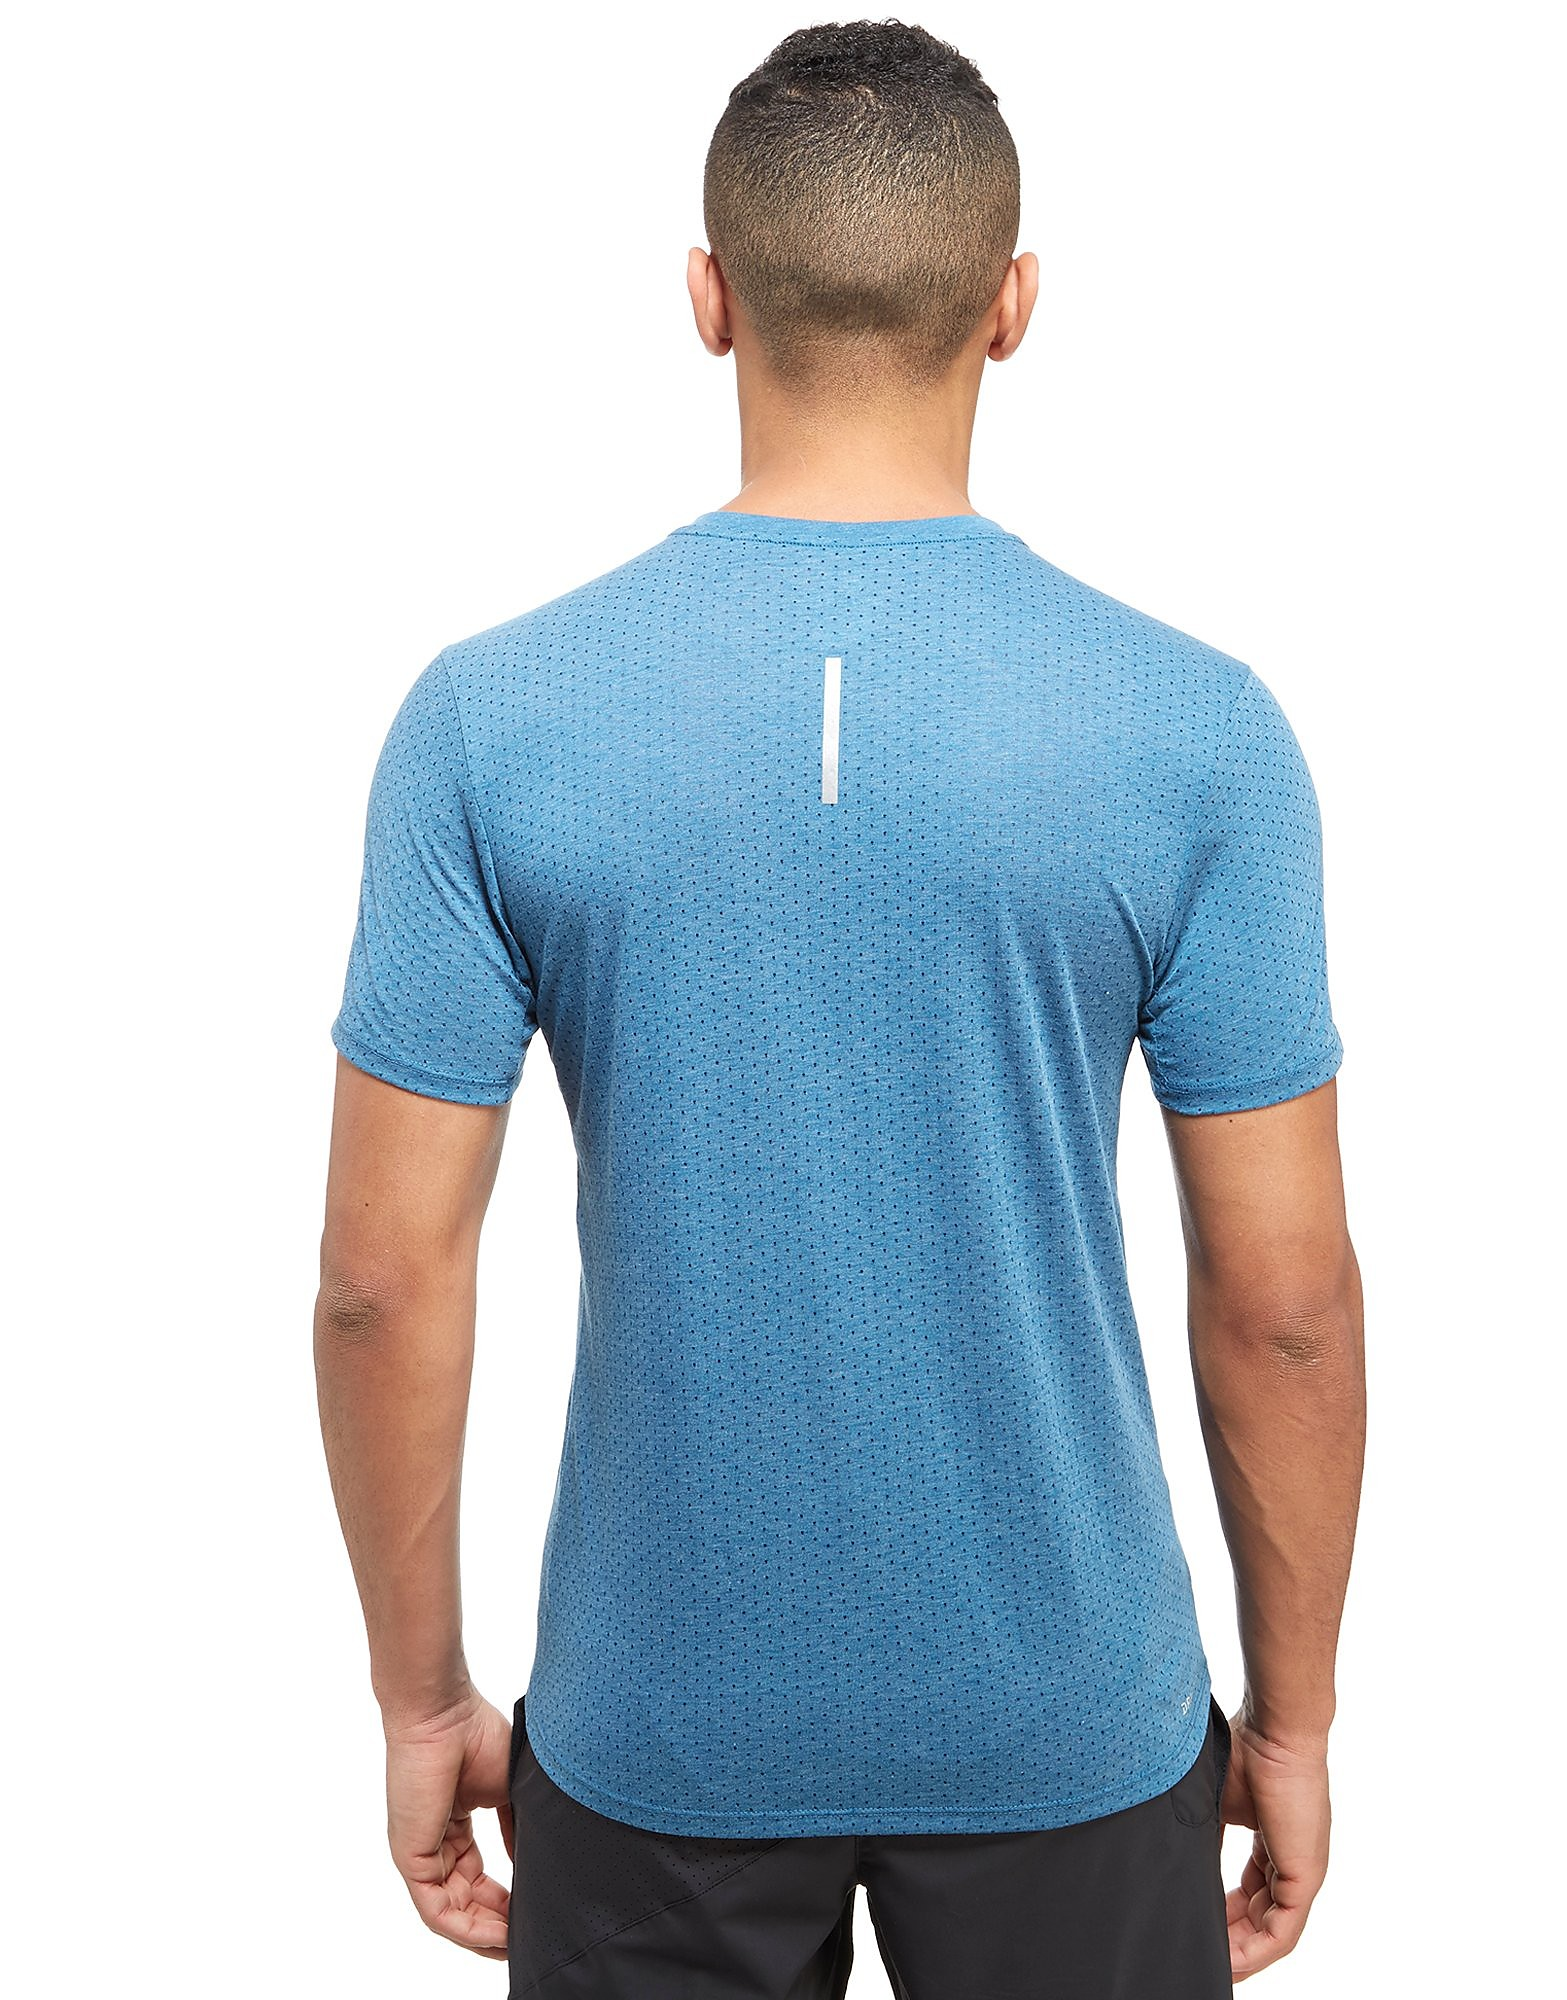 Nike Tailwind T-Shirt